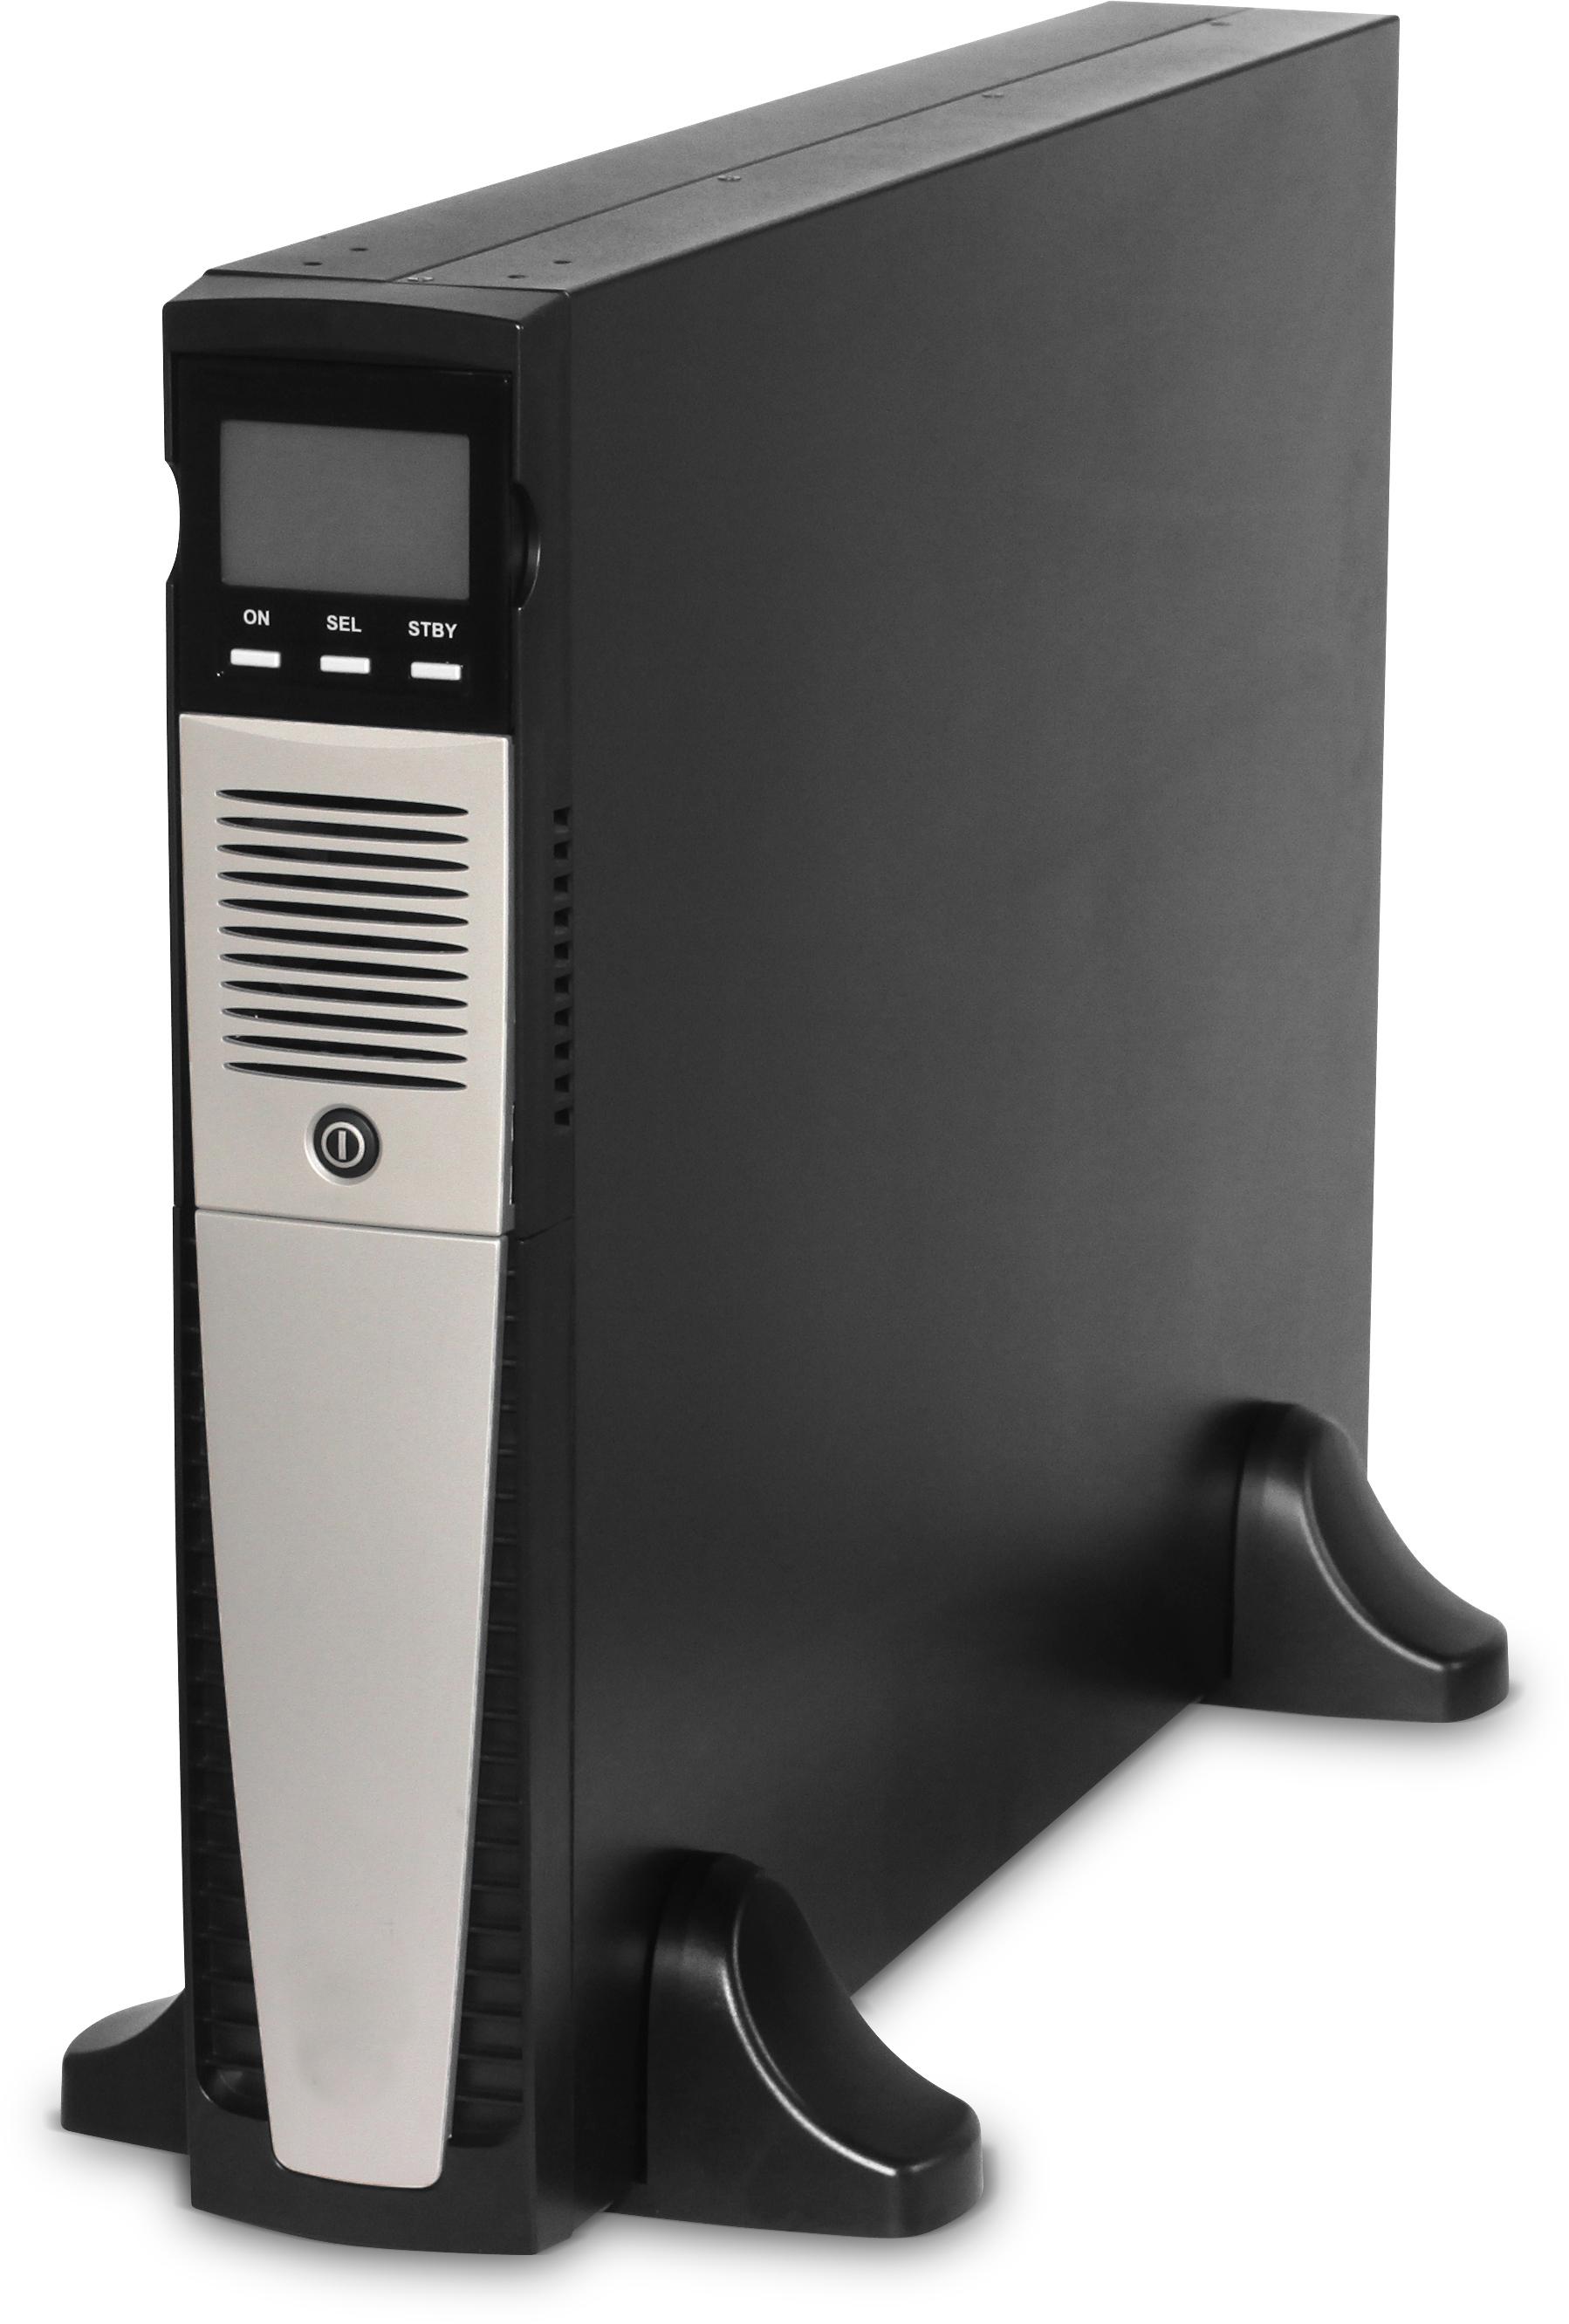 1 Stk USV GENIO Dual Midi ER 2200VA 1760W 0 Min.1/1ph./Online USPRD220ER